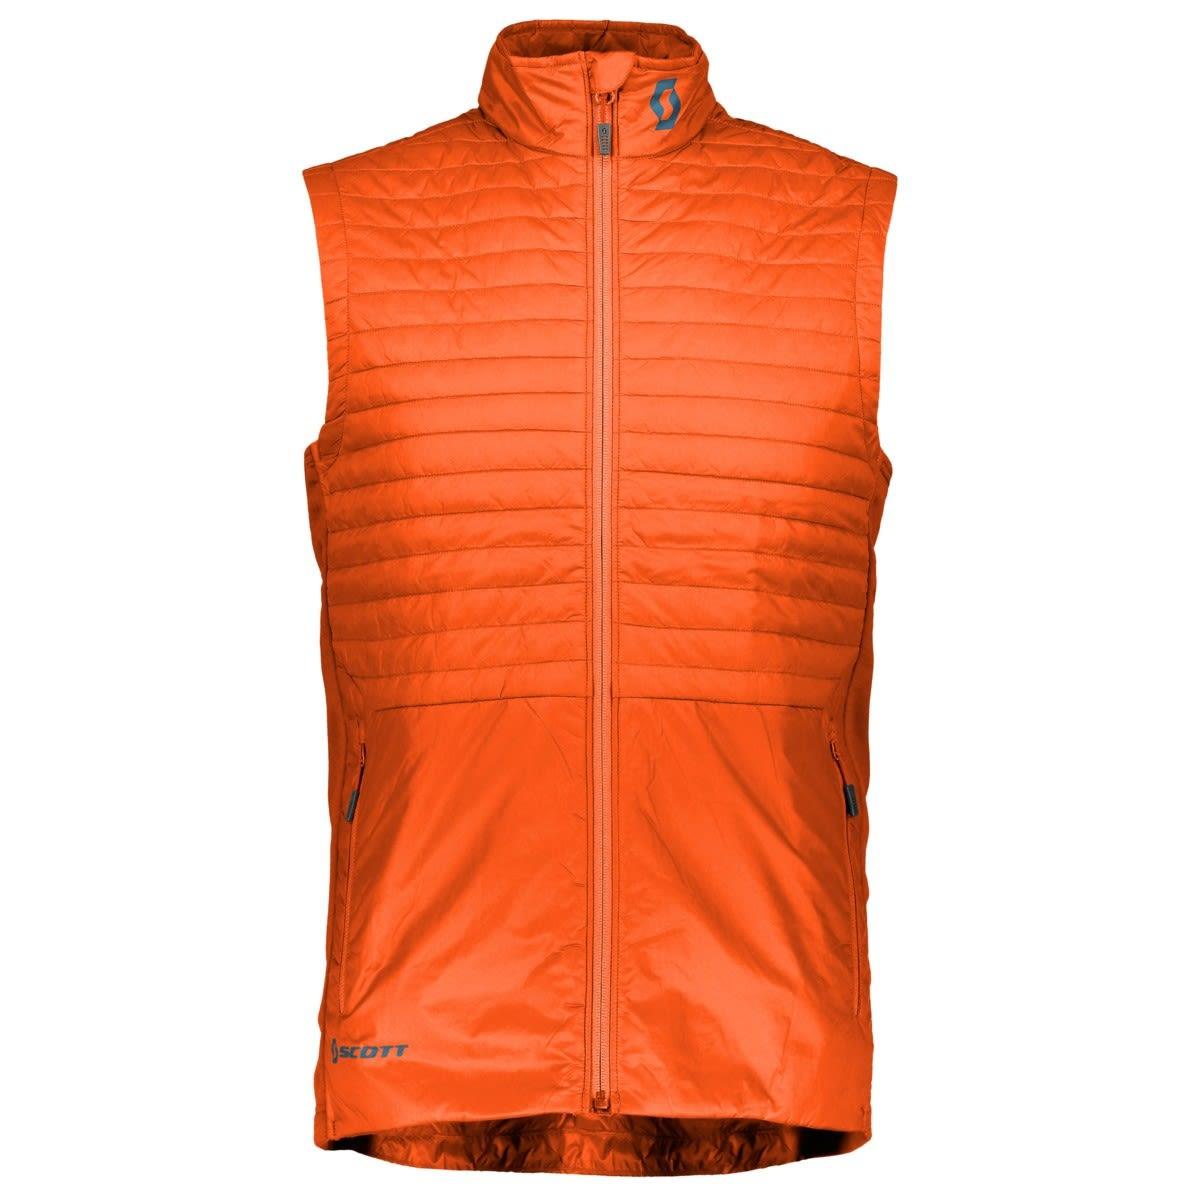 Scott M Insuloft Light Vest, Moroccan Red | Herren Isolationsweste